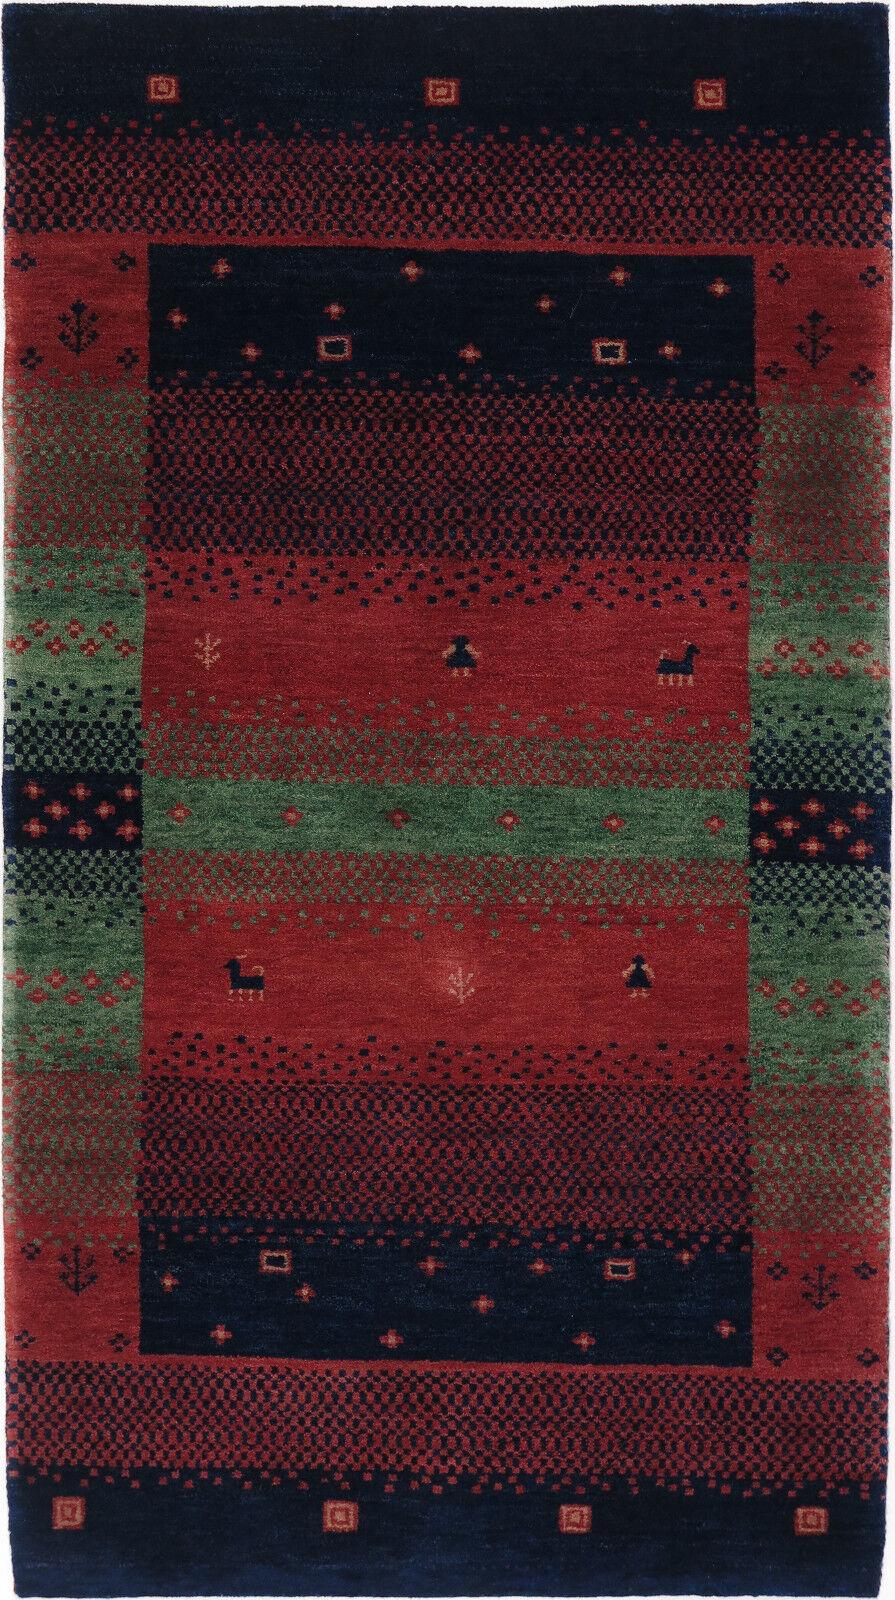 Gabbeh Tappeto Rug Carpet parte di Tapis tapijt Tappeto Alfombra Orient Persiani GASHGAI